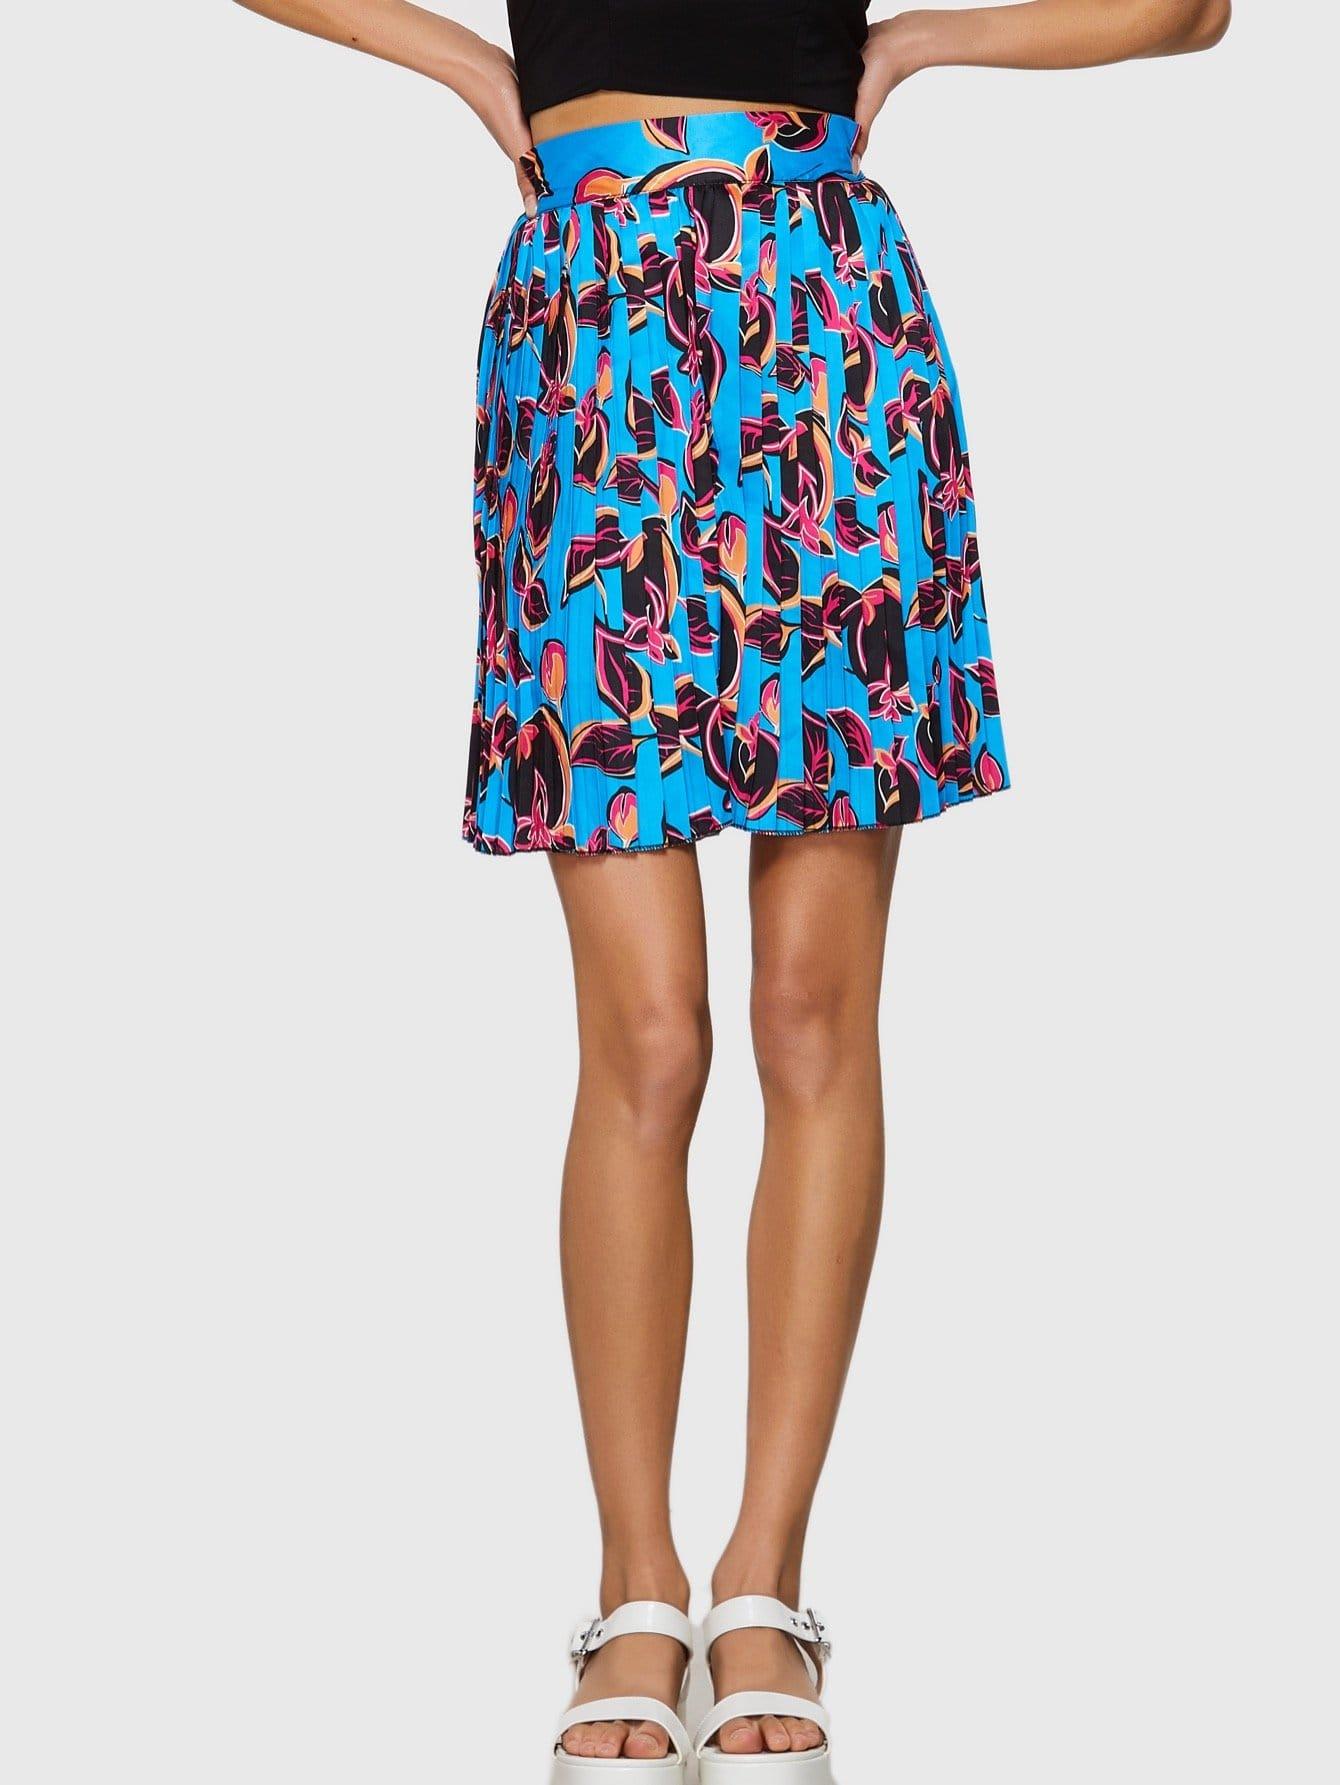 Купить Широкая полосатая круглая круглая юбка, Ruby Muldoon, SheIn